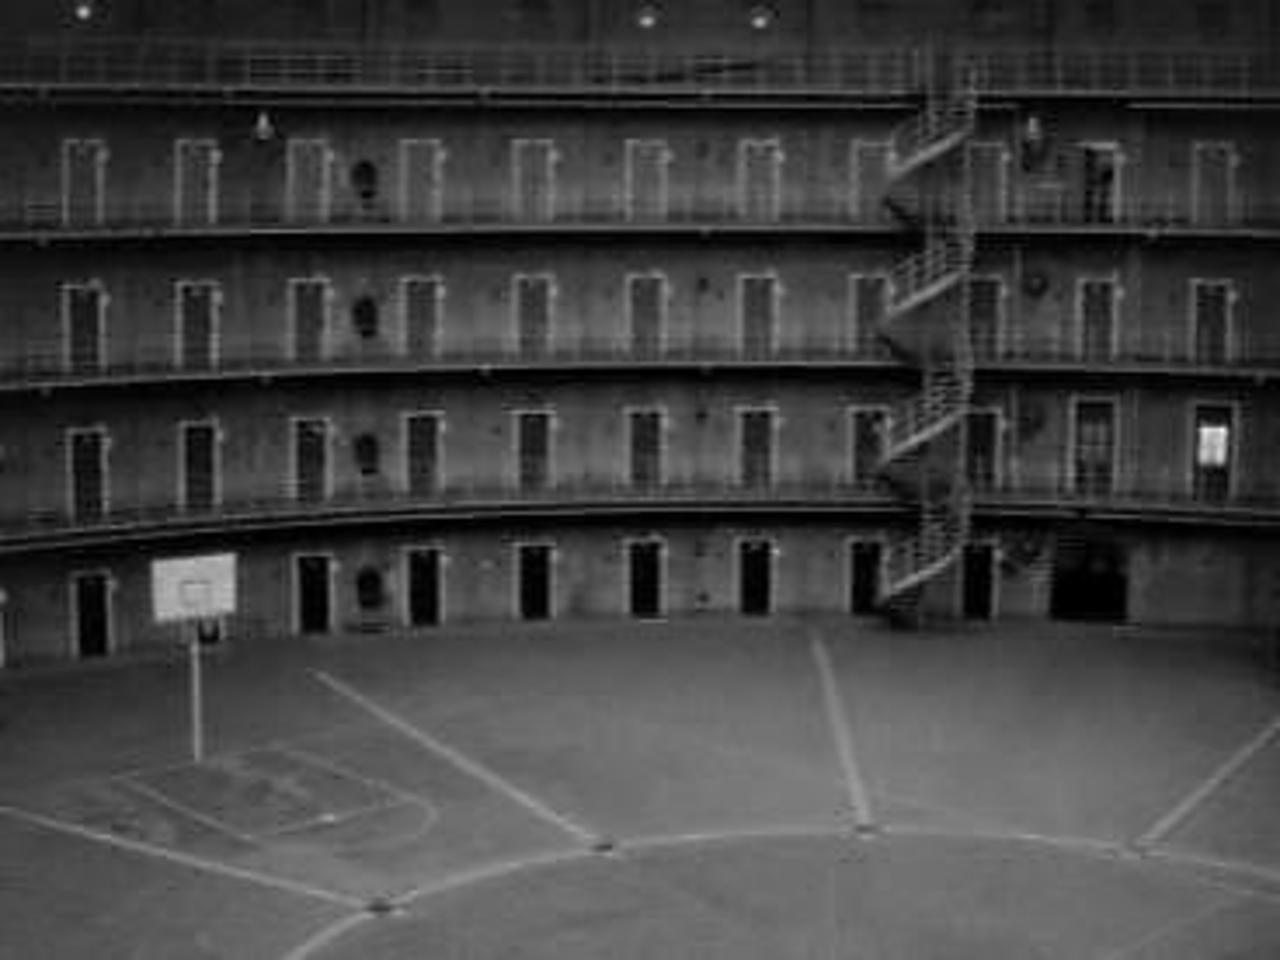 Koepel haarlem jail around the world pinterest prison for Gevangenis de koepel haarlem